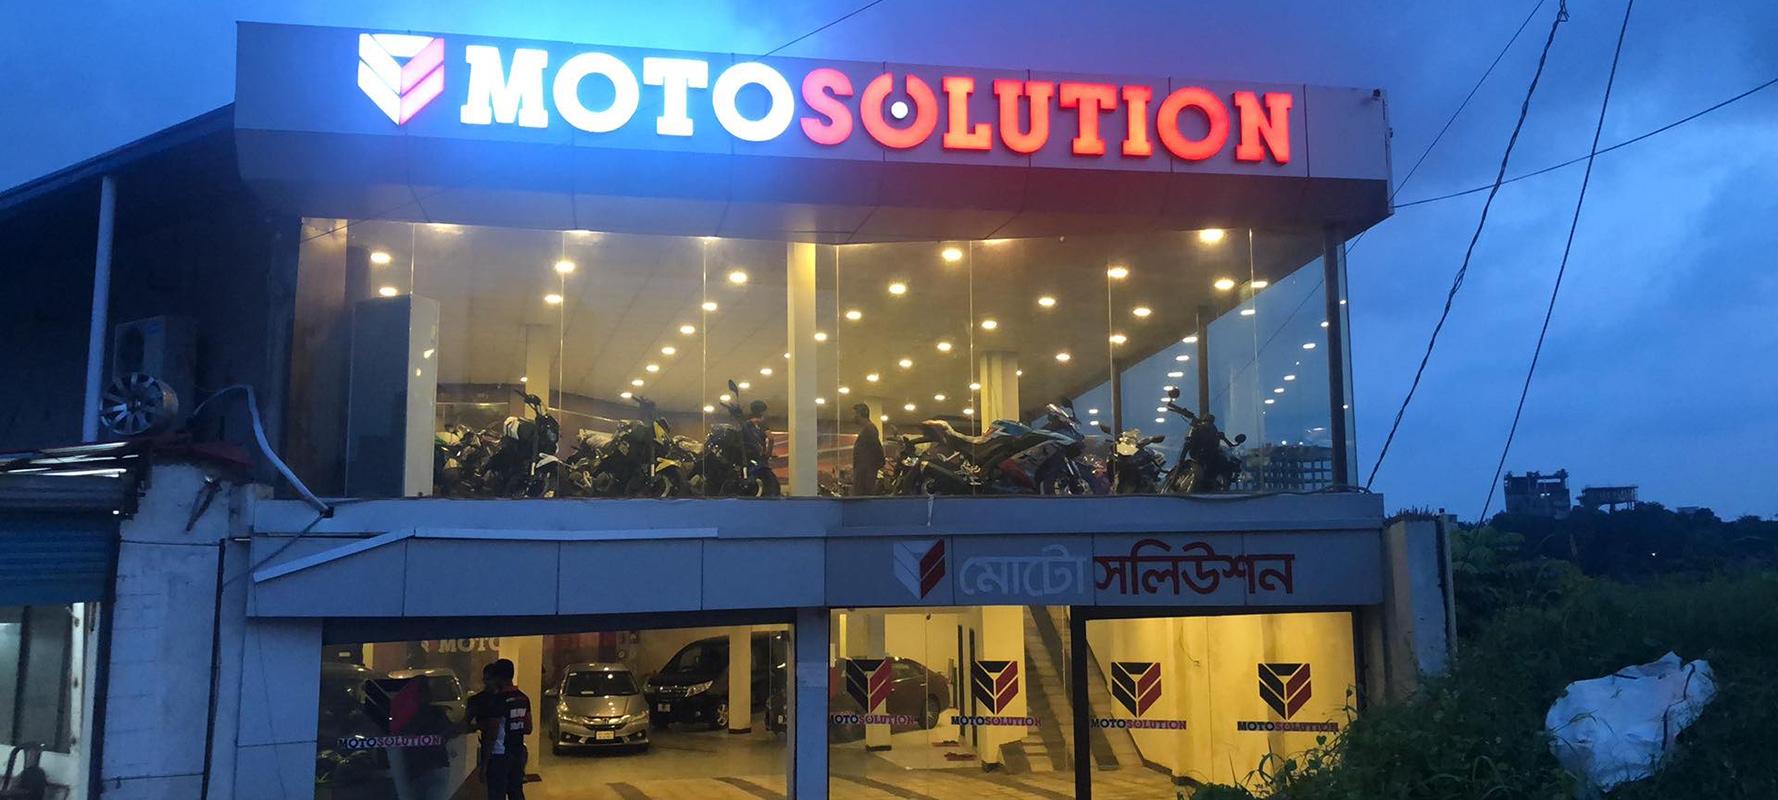 motosolution-dhaka.jpg